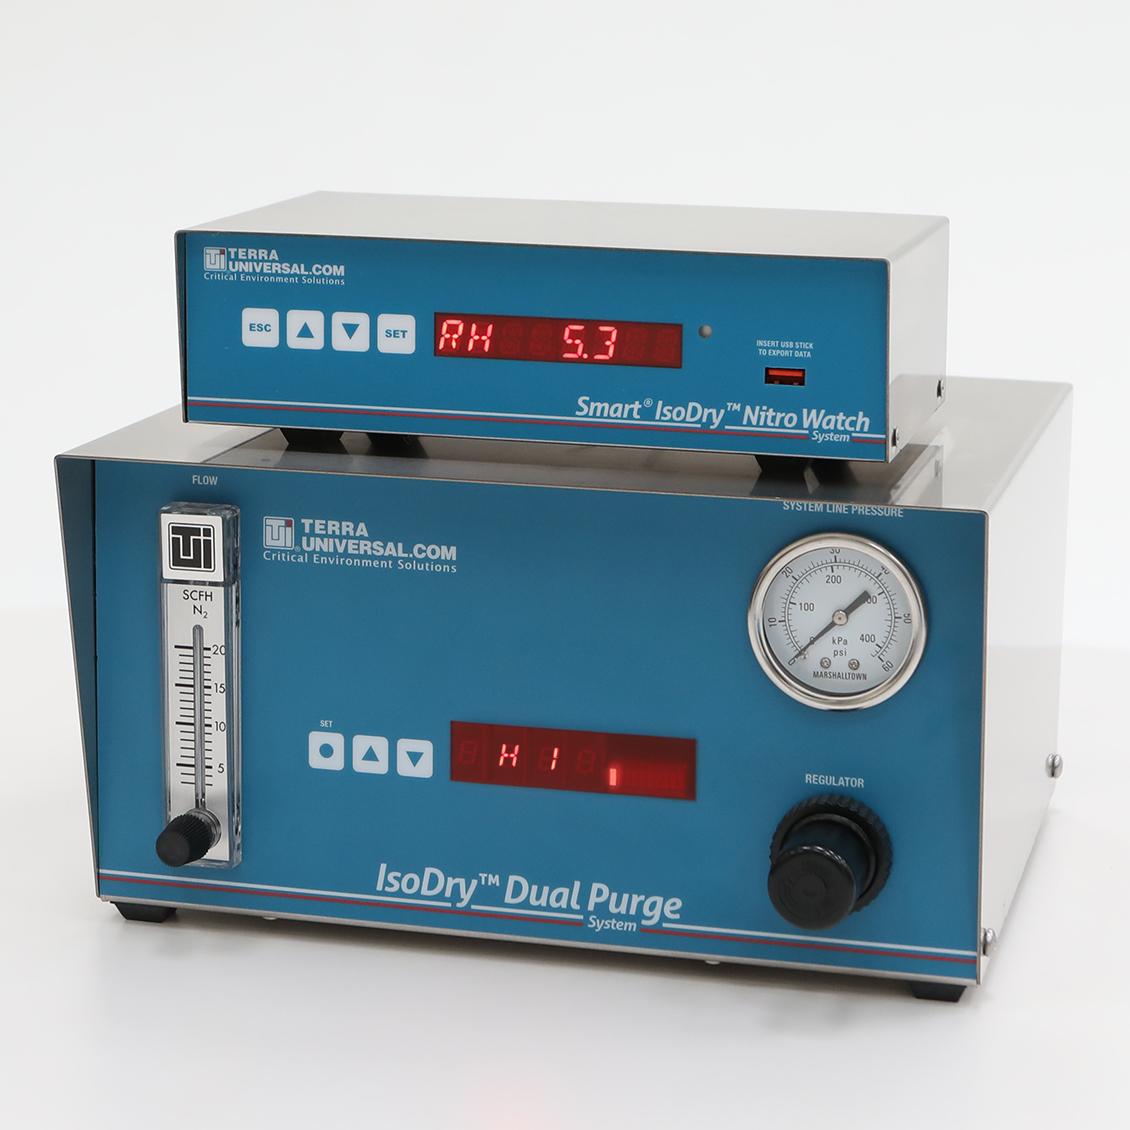 IsoDry™ Dual Purge controller